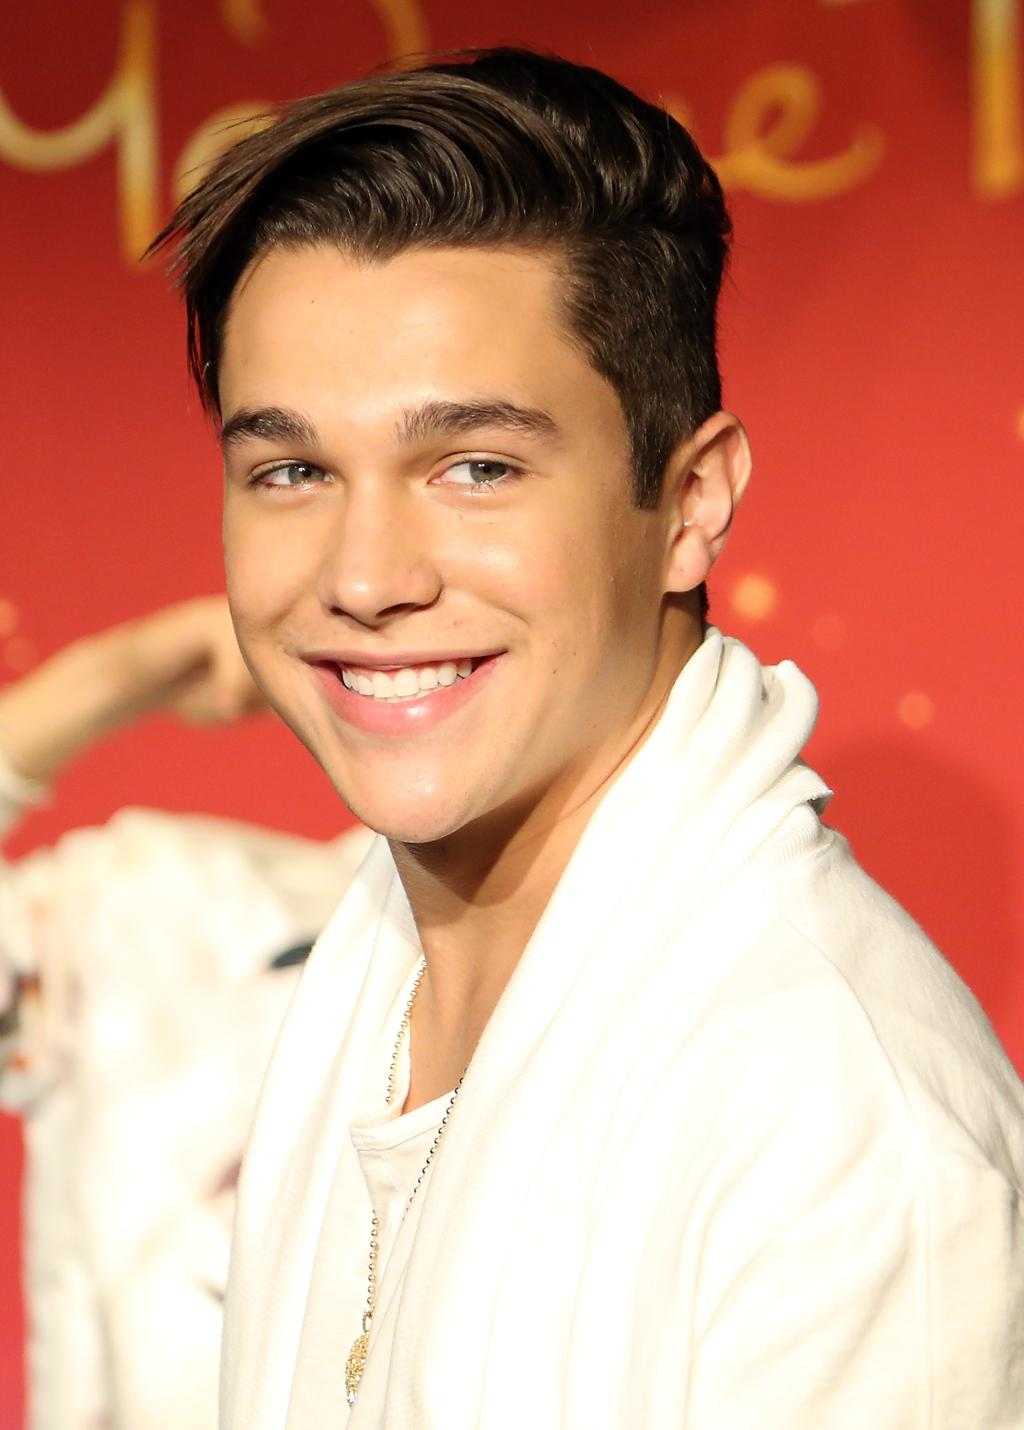 Teen Idols 4 You : Teen Entertainment News]